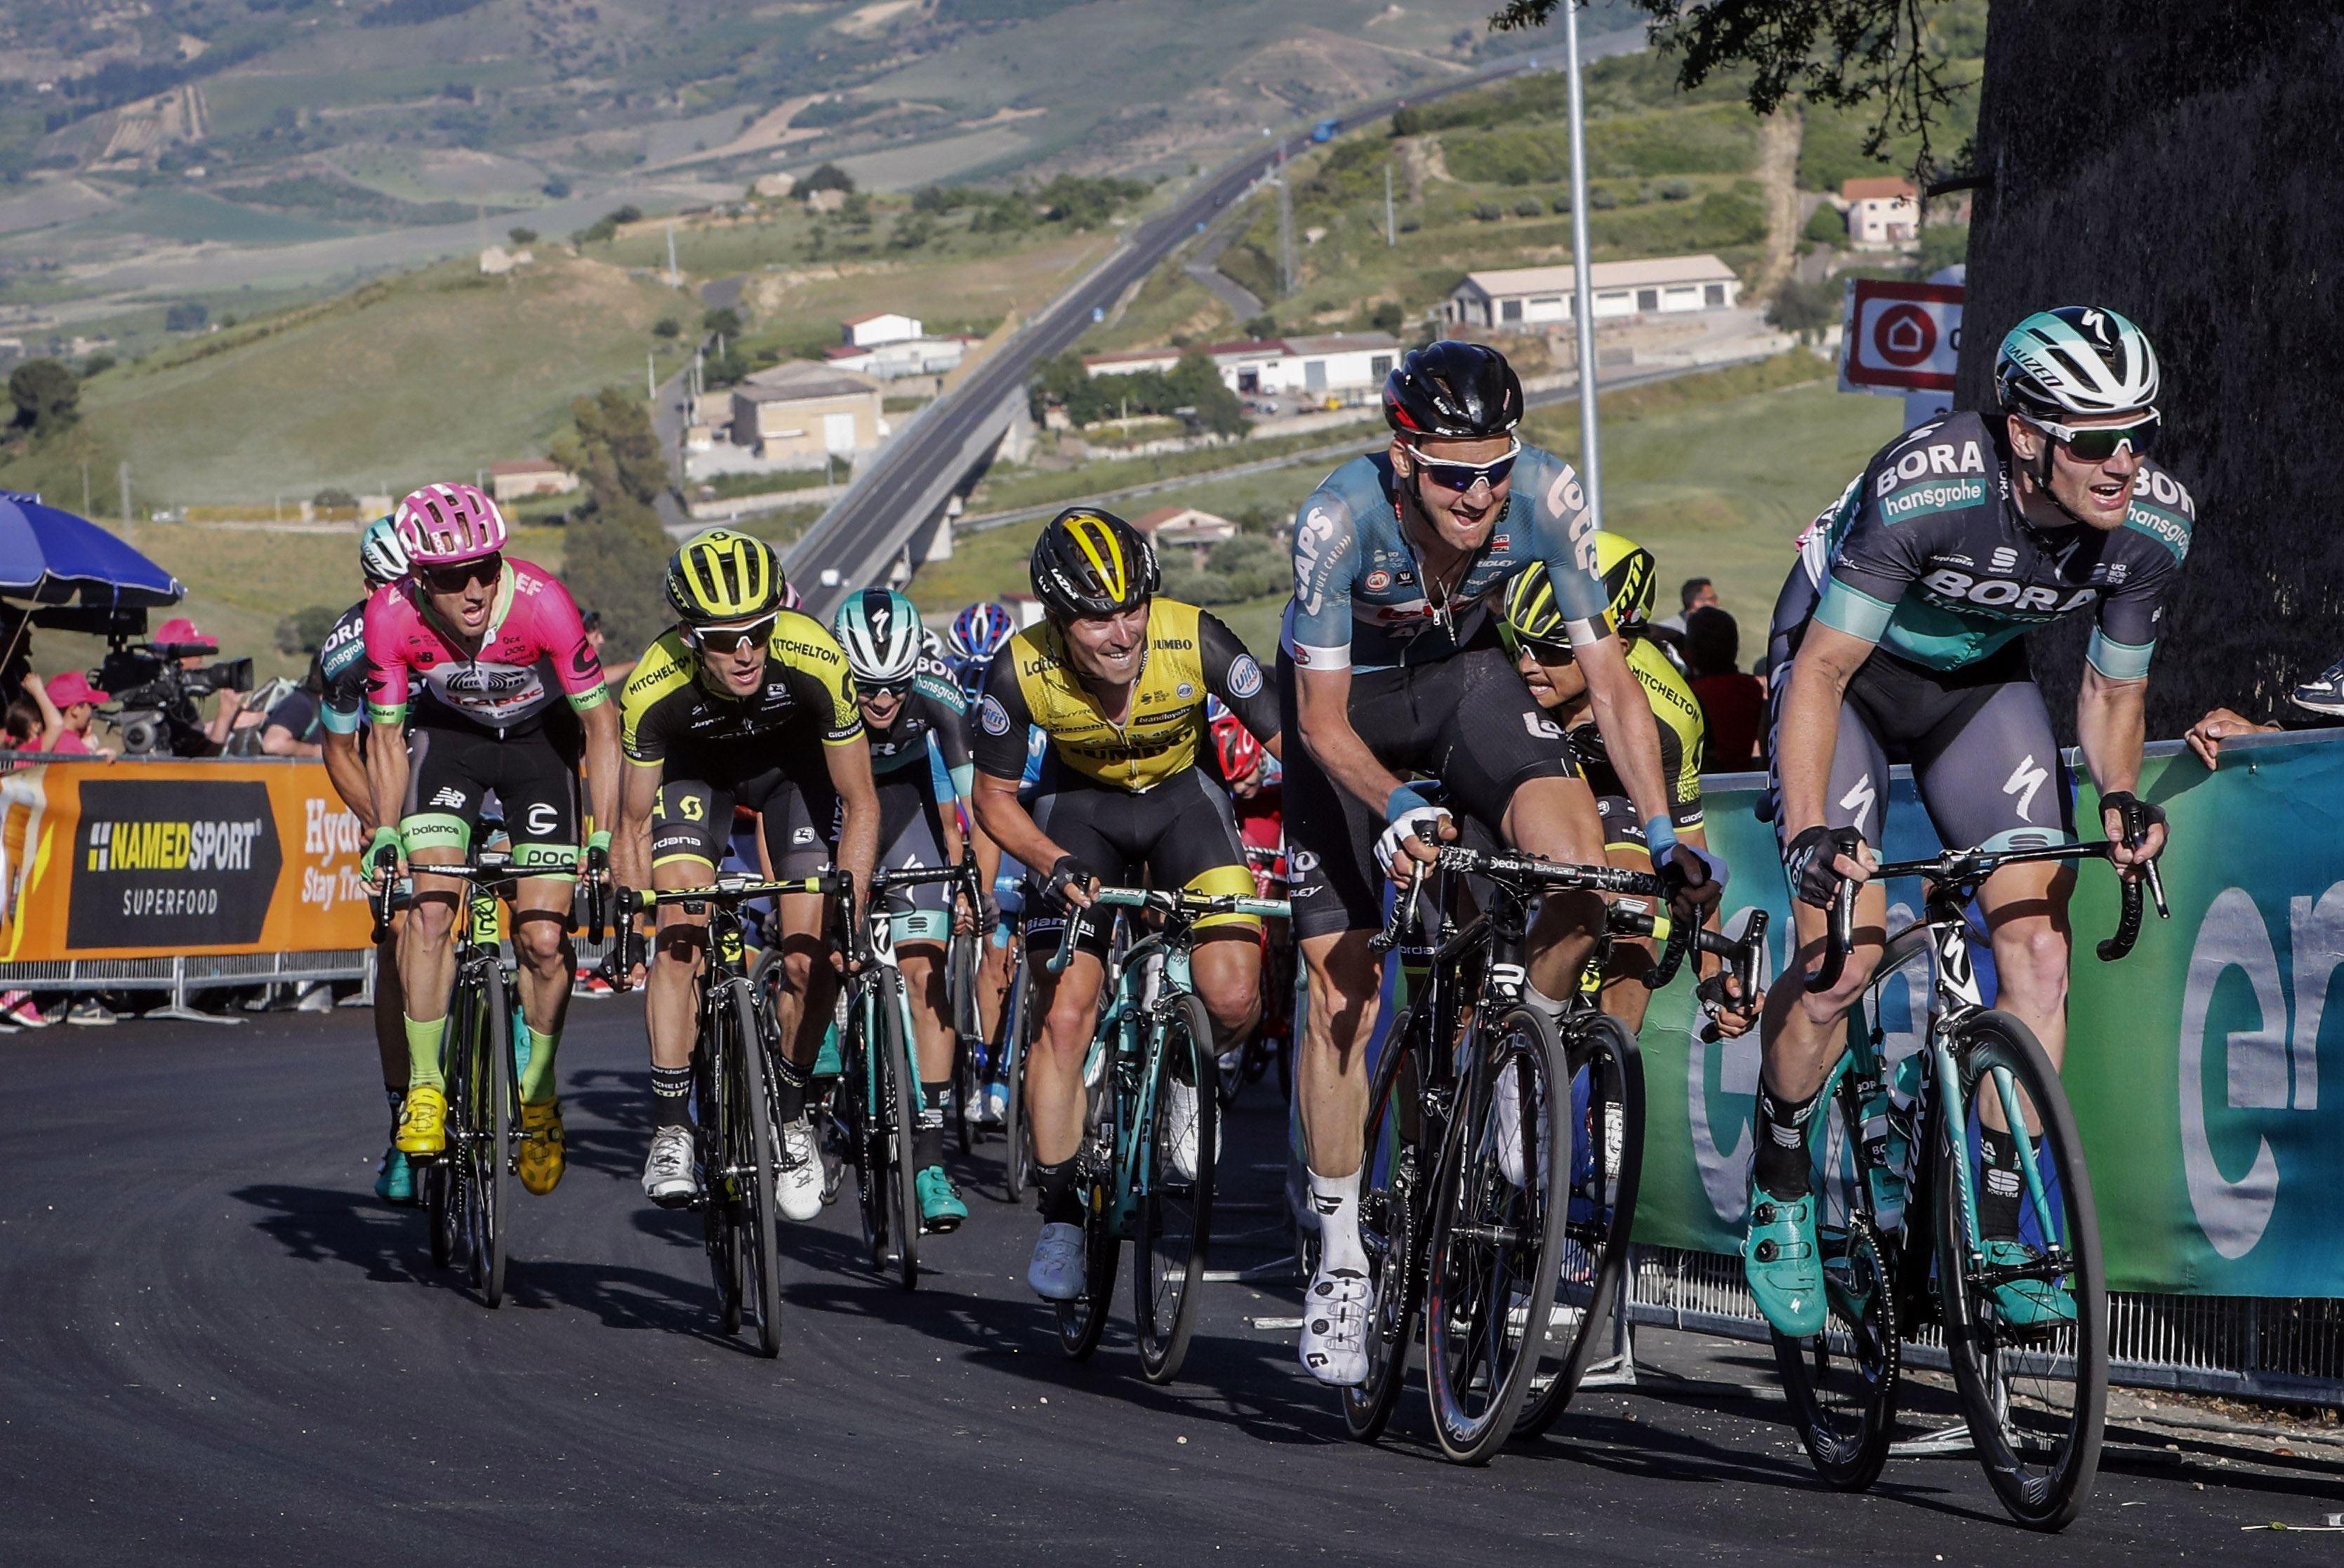 Tim Wellens, Giro d'Italia 2018